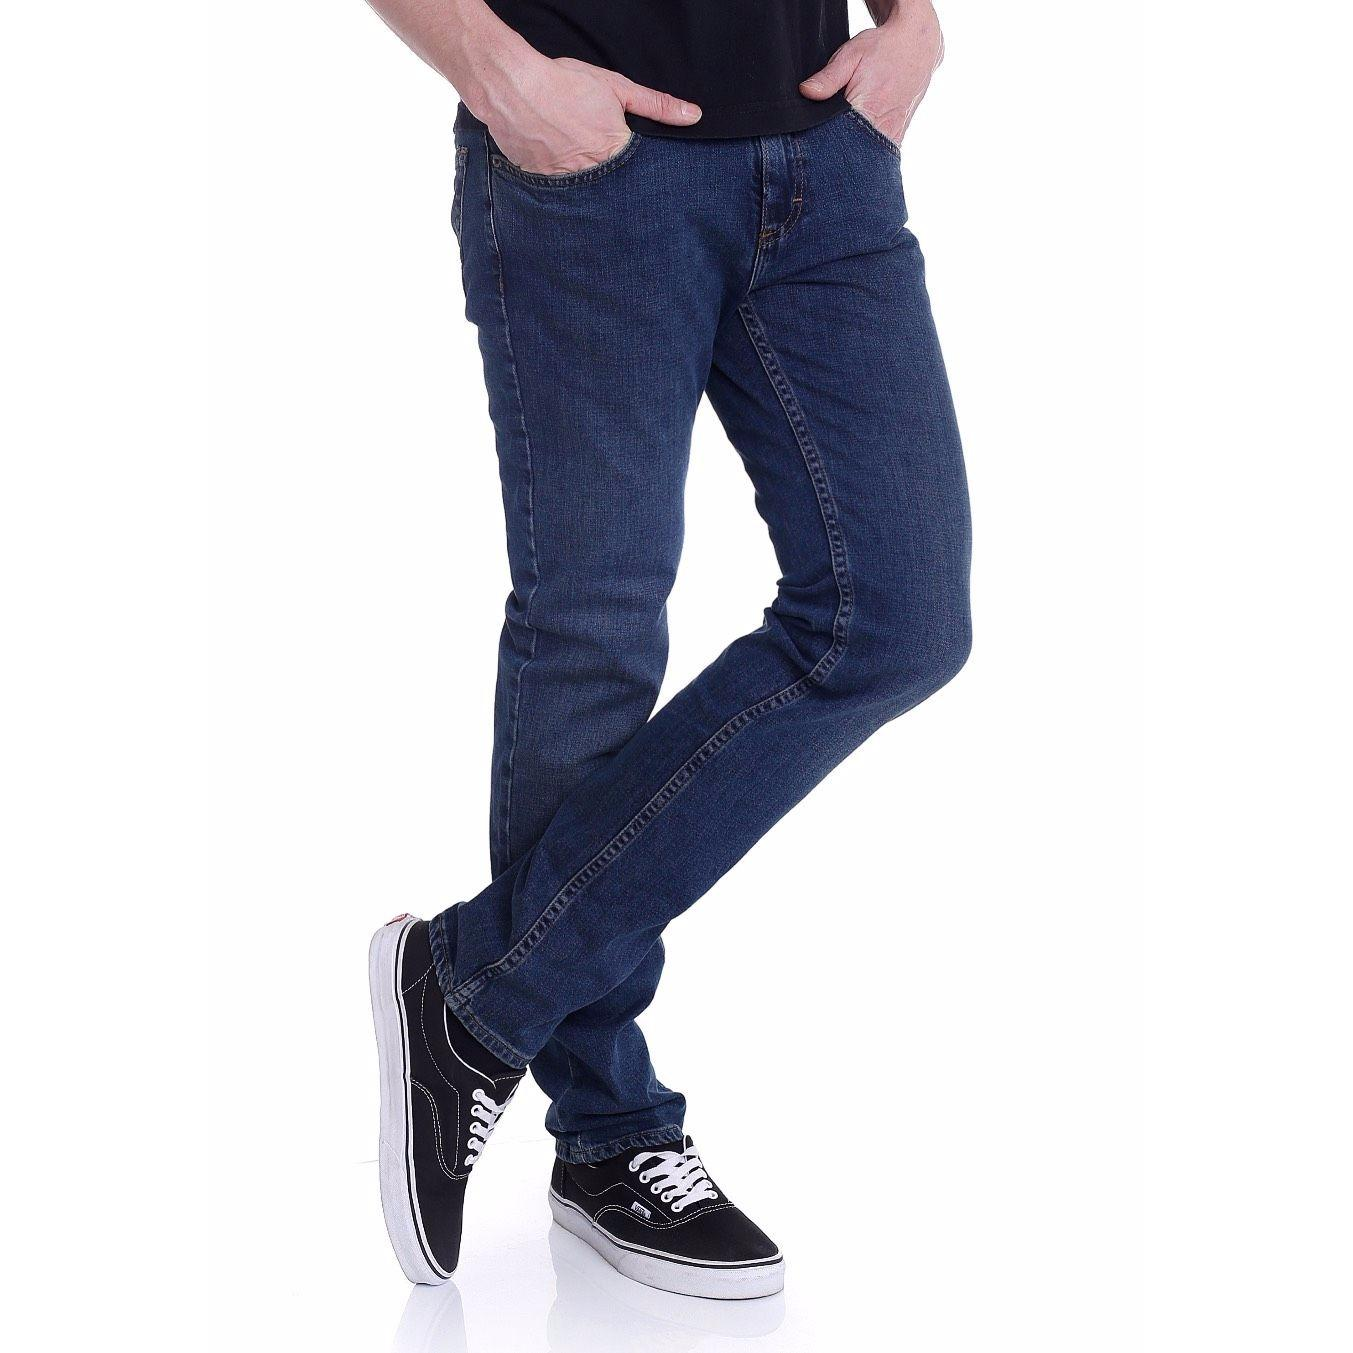 Jual Kerak Store Celana Jeans Pria Premium Skiny Jeans Pria Strreat Antik